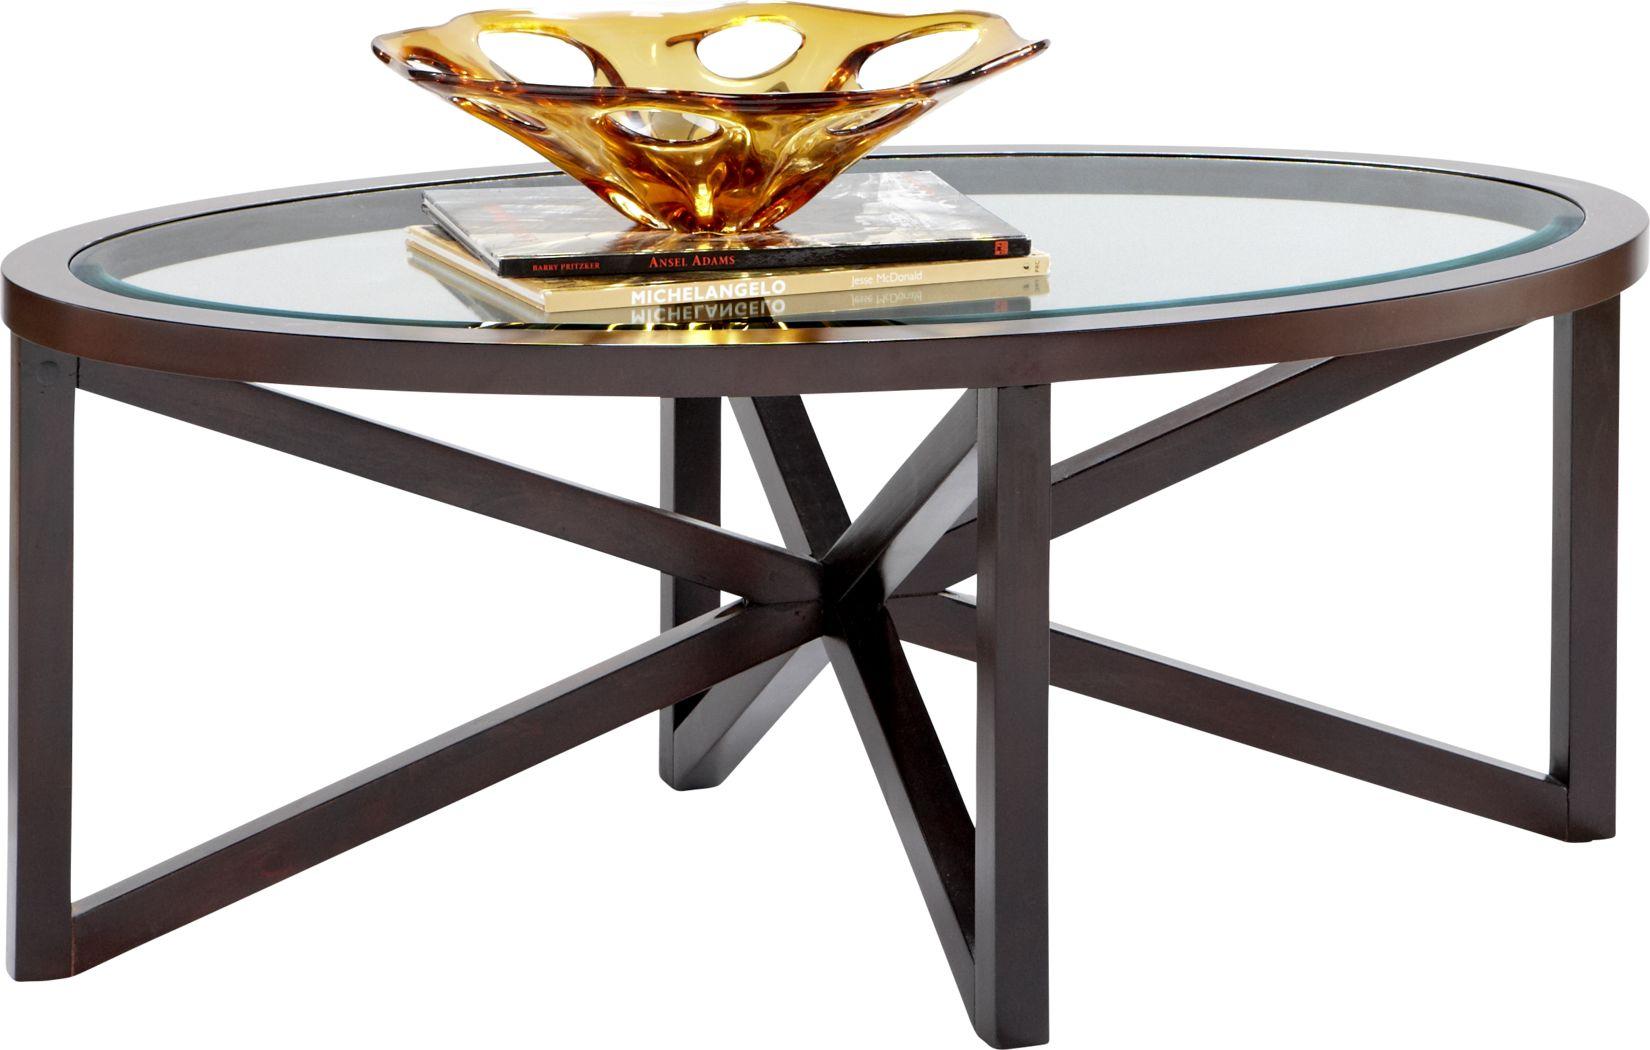 Kenshaw II Espresso Cocktail Table